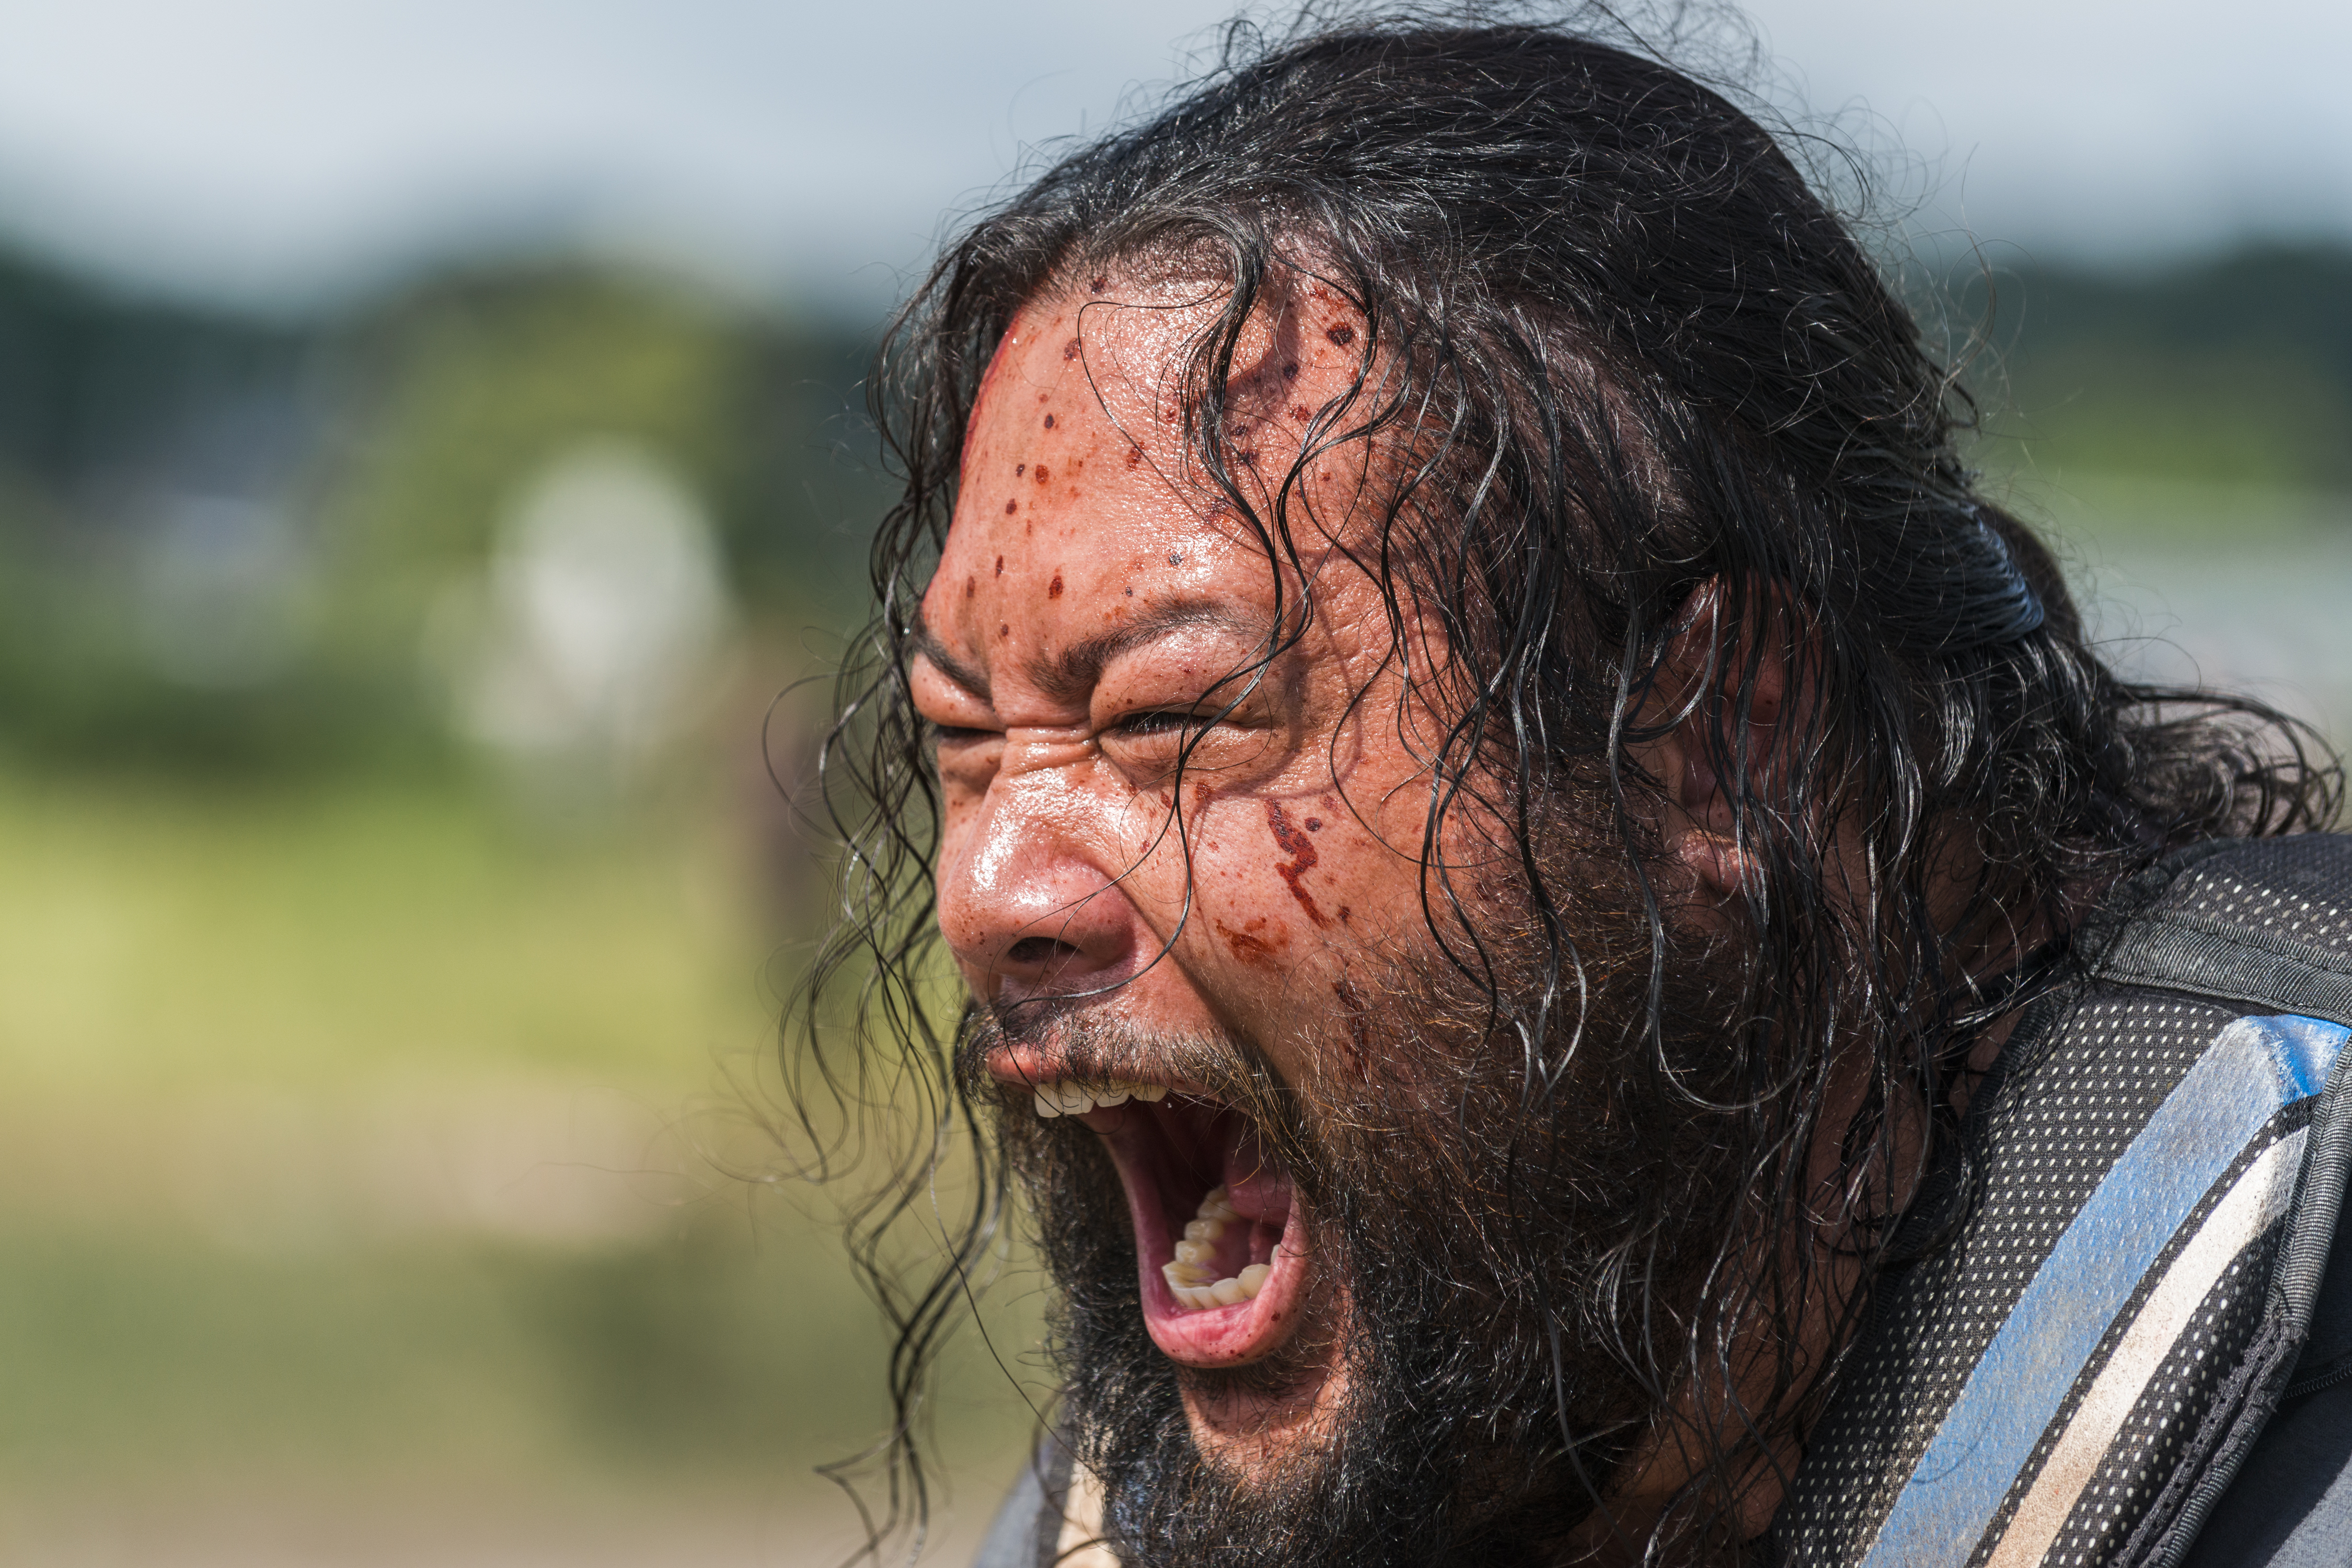 Cooper Andrews as Jerry in The Walking Dead Season 8, Episode 4